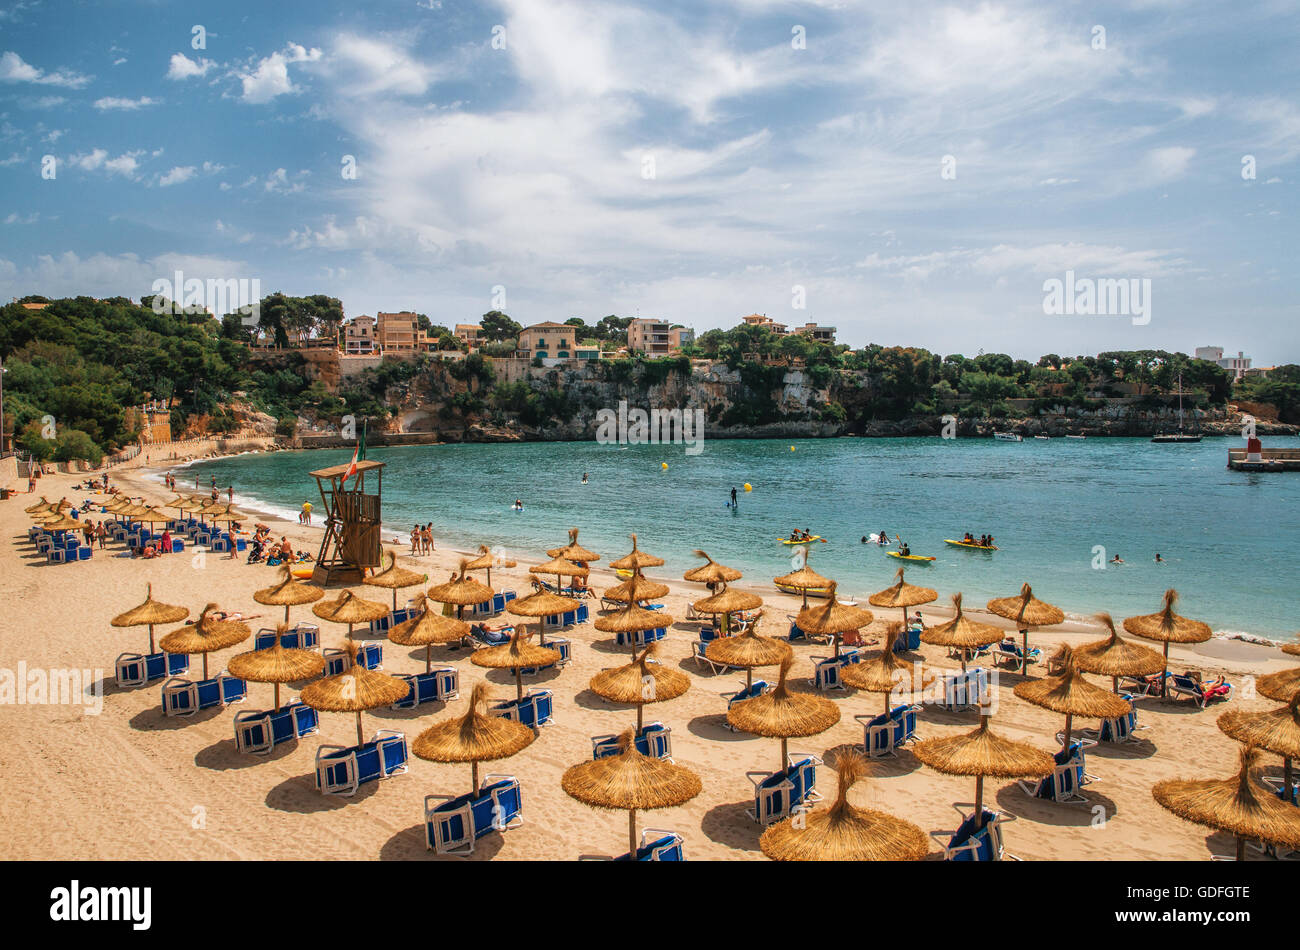 Straw umbrellas on the beach in Porto Cristo on Mallorca, Balearic Islands, Spain - Stock Image